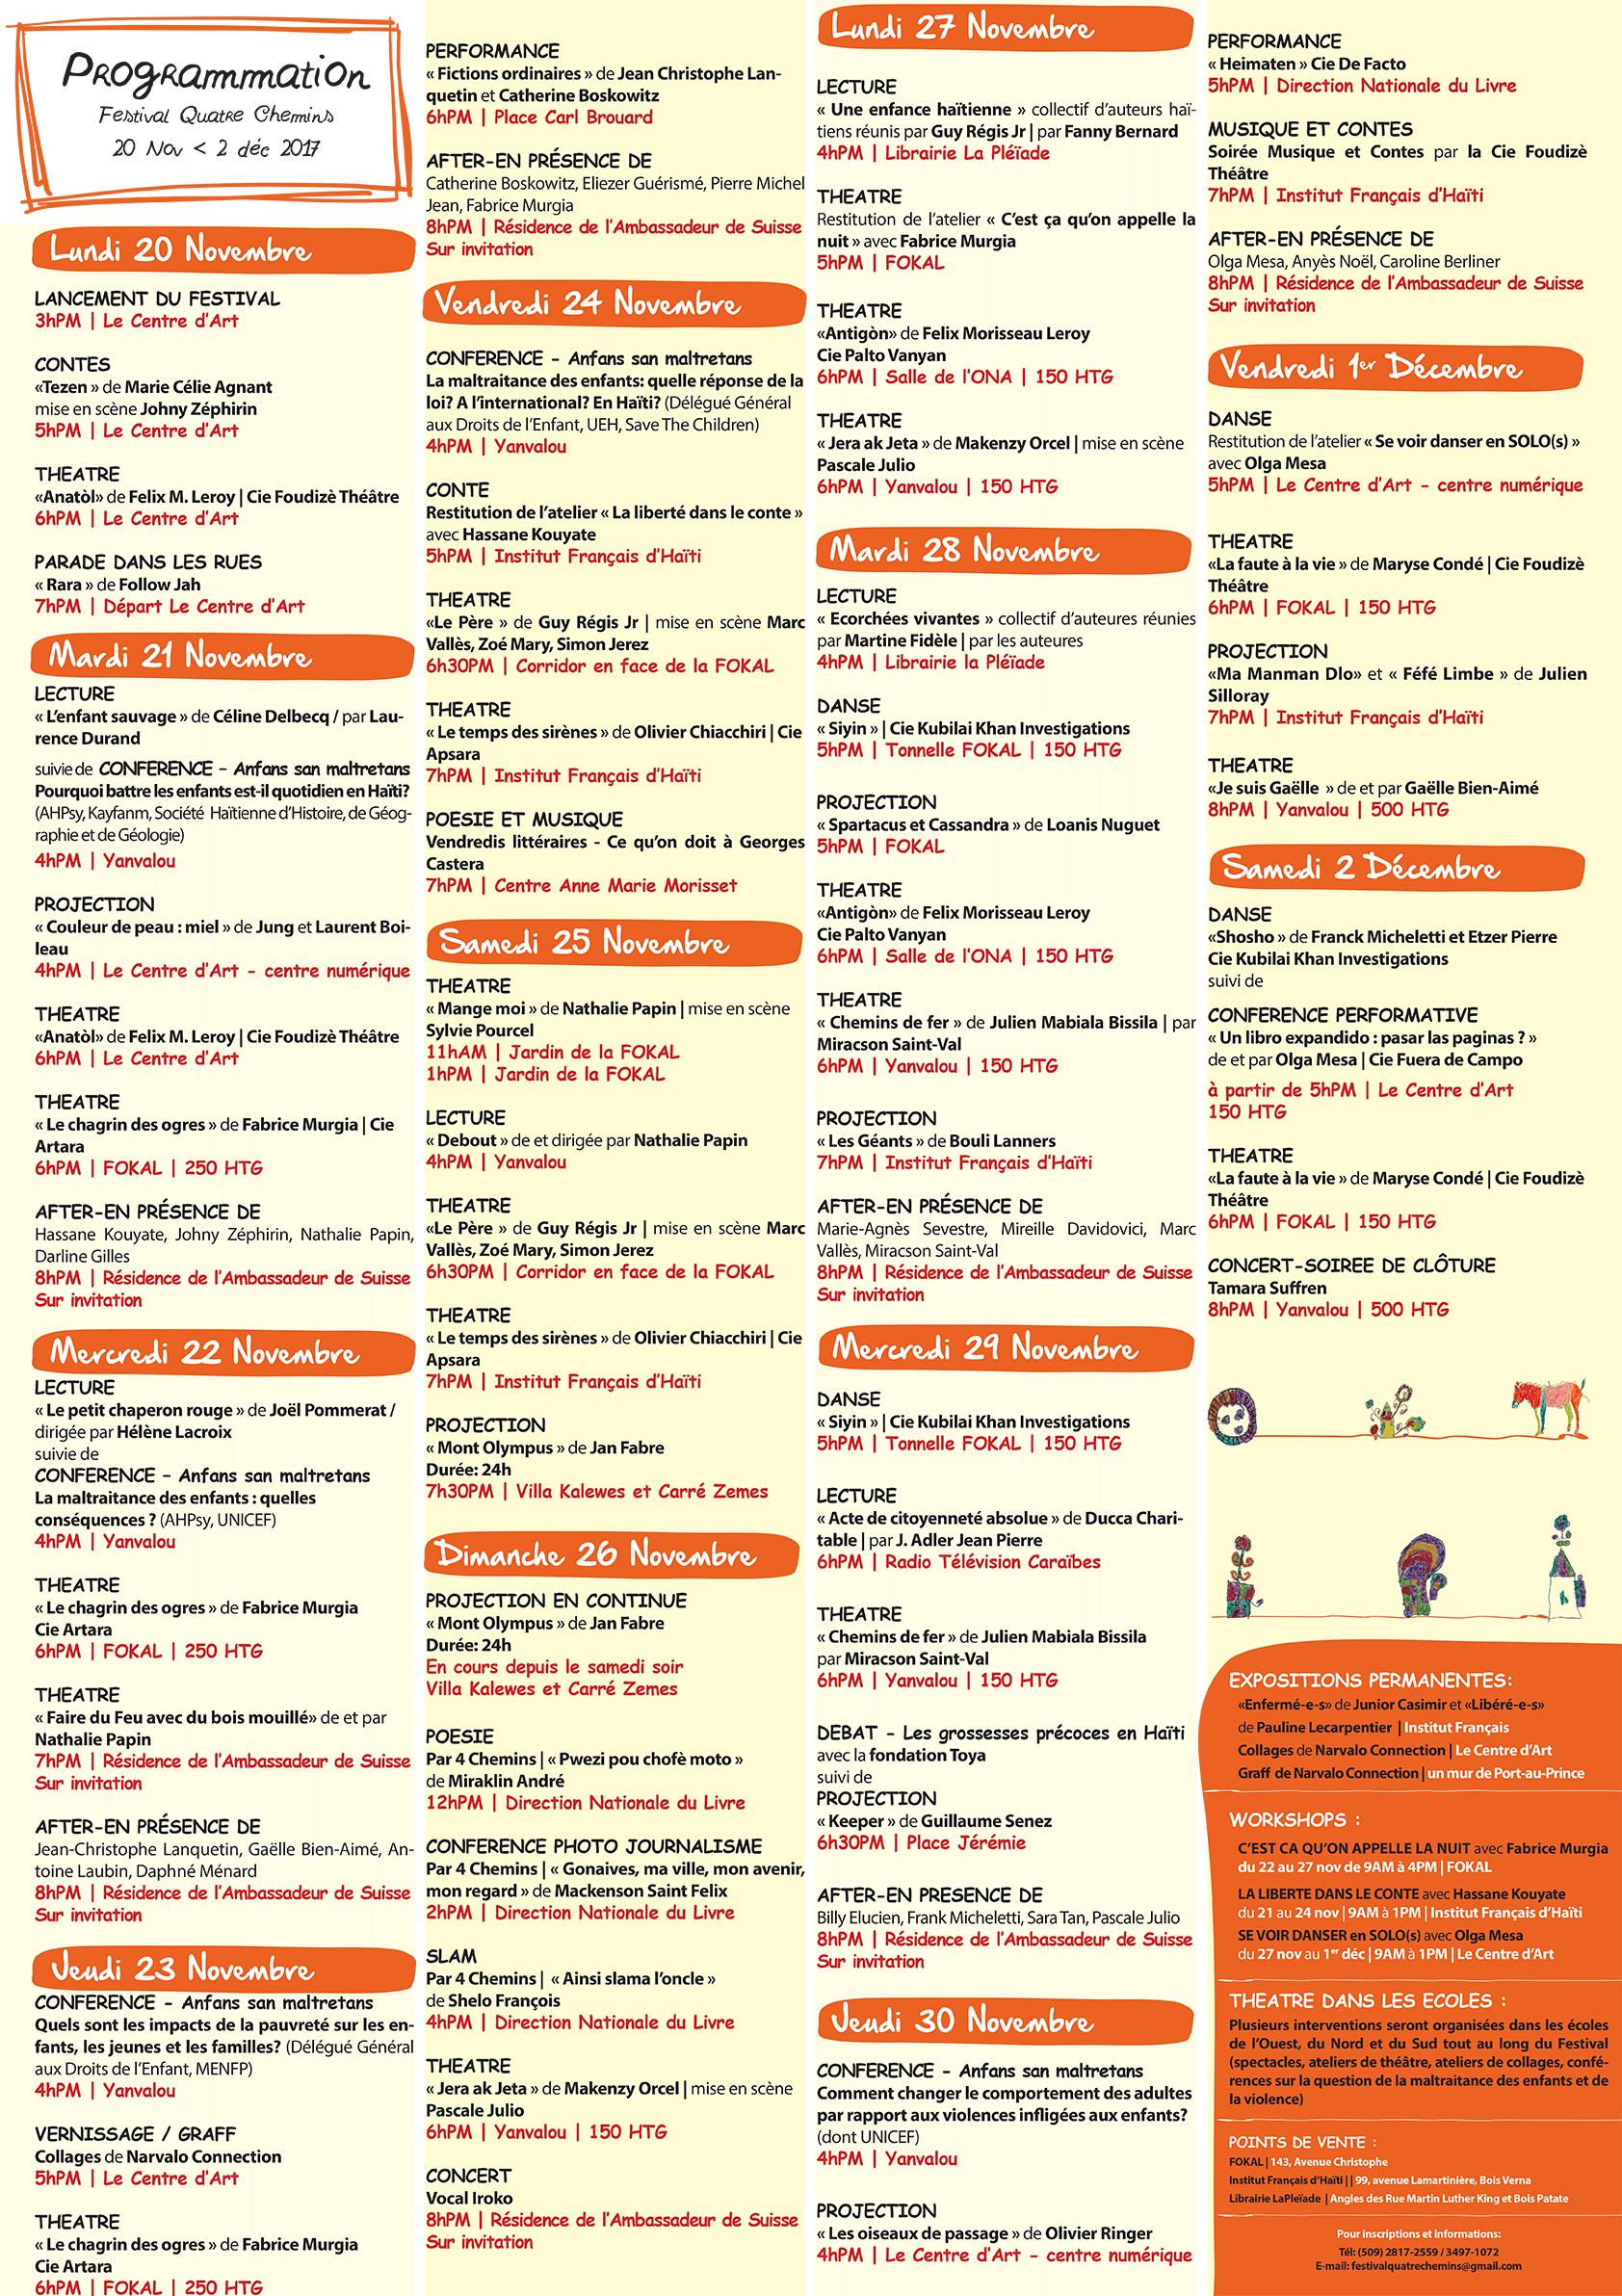 Calendrier Festival.Icihaiti Rappel 14eme Edition Du Festival De Theatre 4